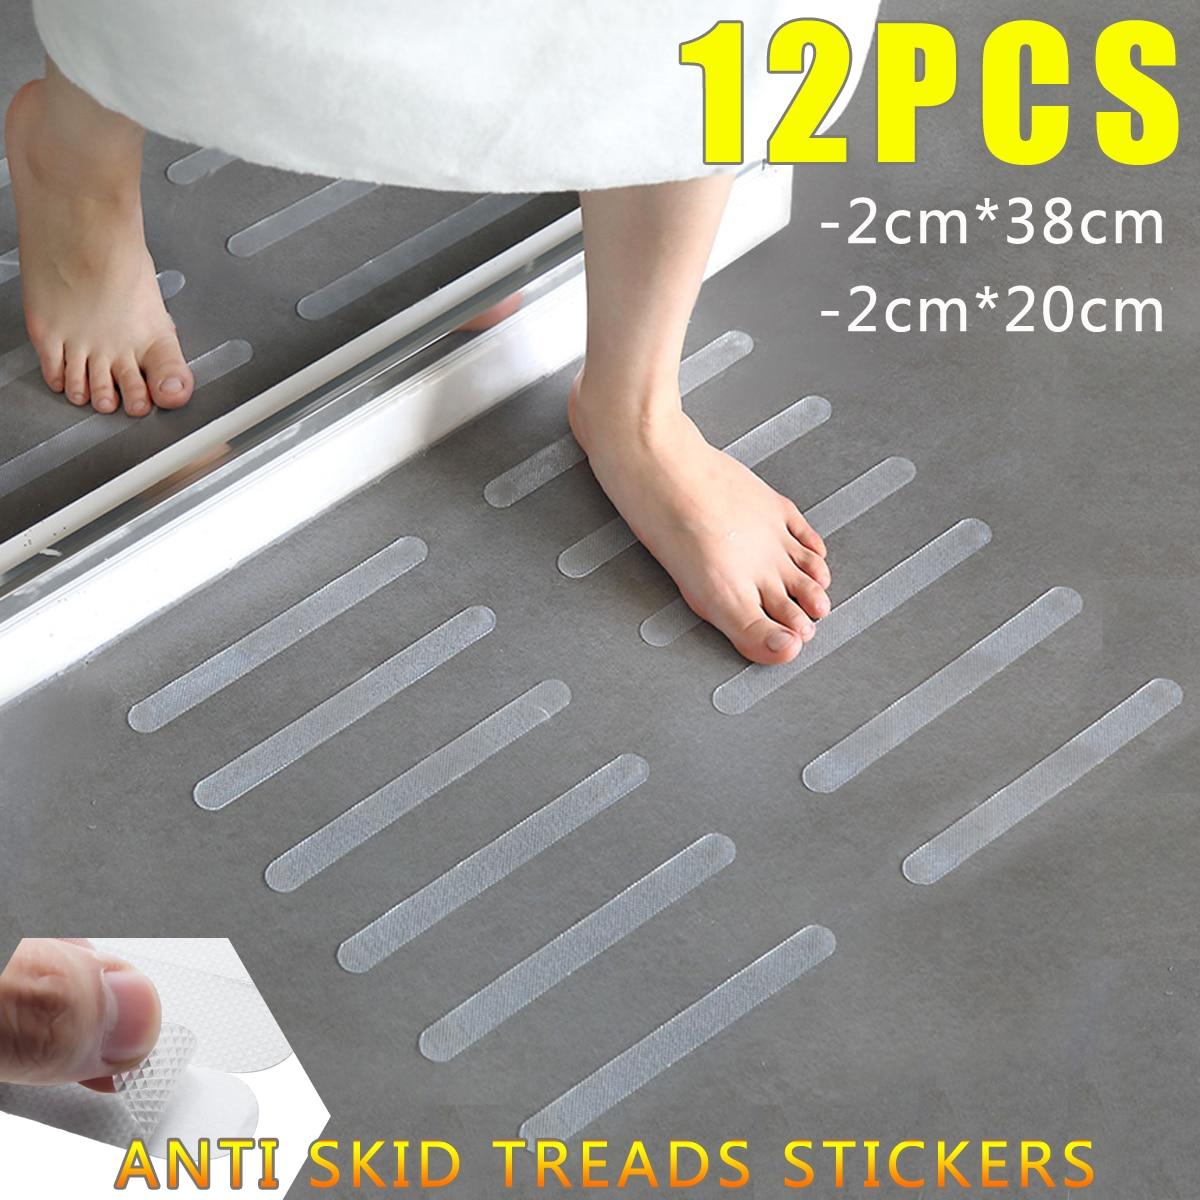 Beau 12Pcs Bathroom Tub Shower Anti Slip Stair Tread Clear Tape Waterproof  Strong Floor Safety Mat Grip